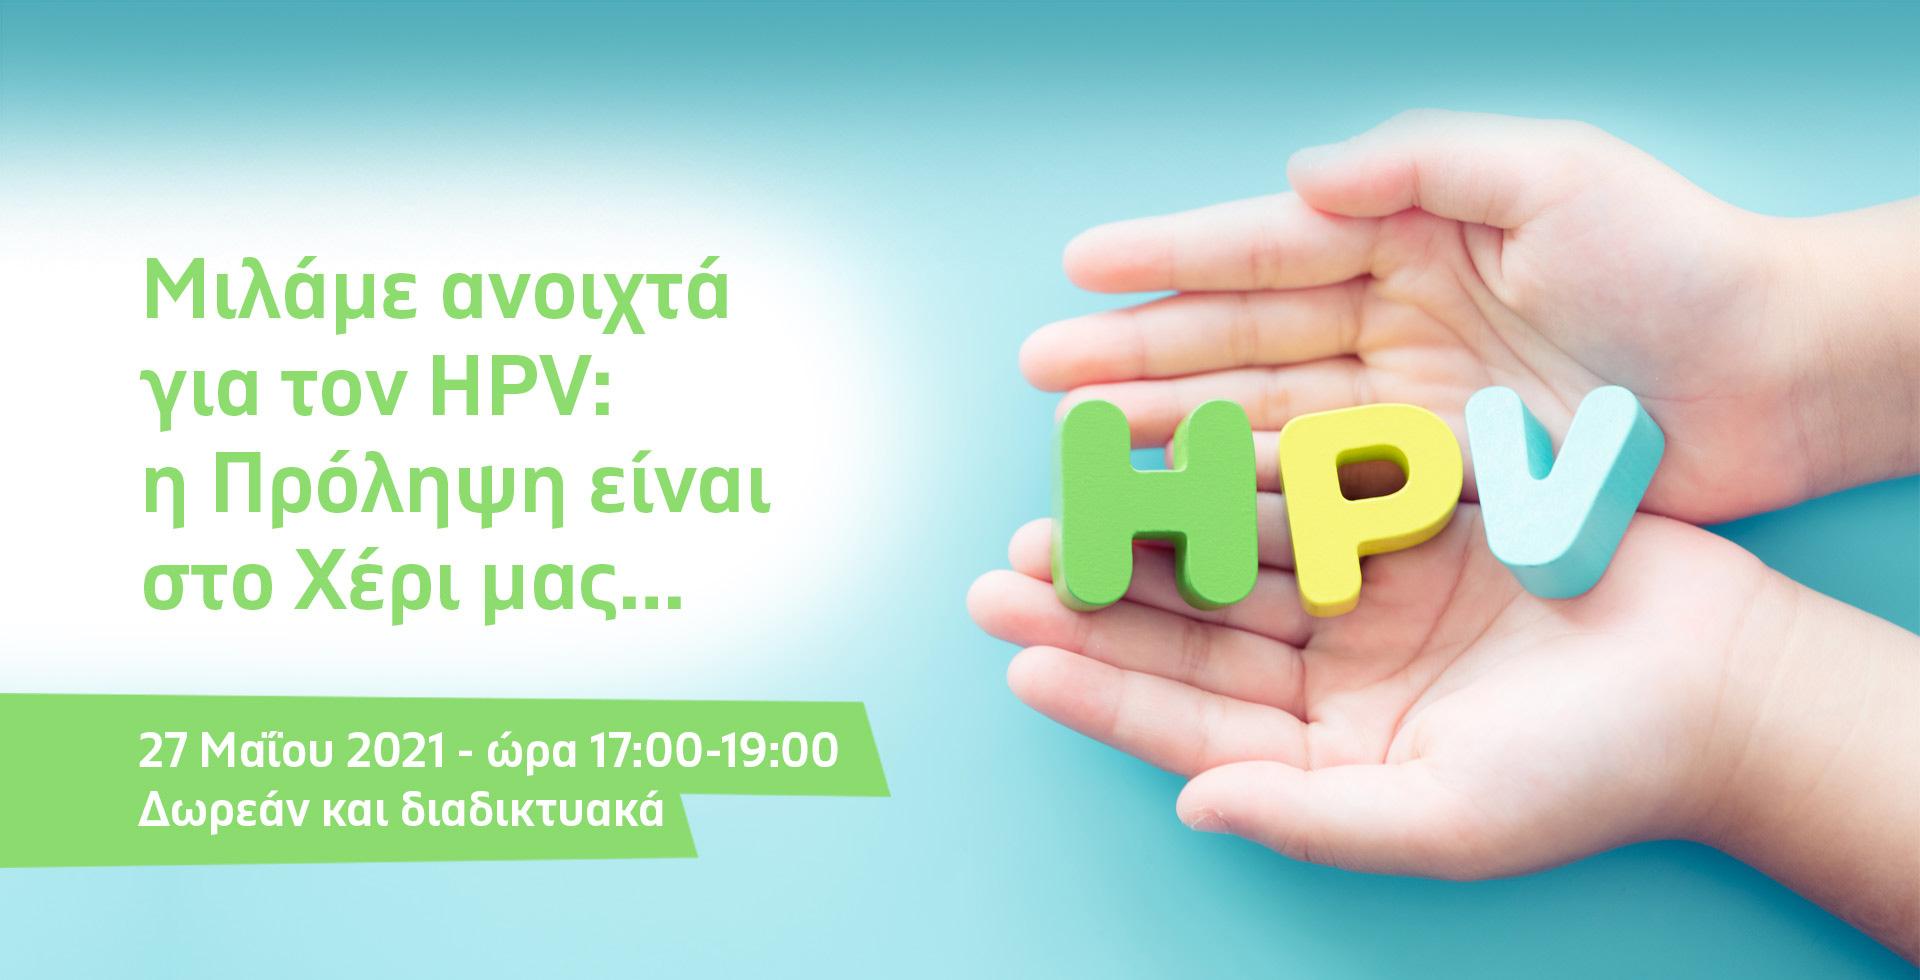 e-Ημερίδα HPV: Μιλάμε ανοιχτά για τον HPV: η Πρόληψη είναι στο Χέρι μας...